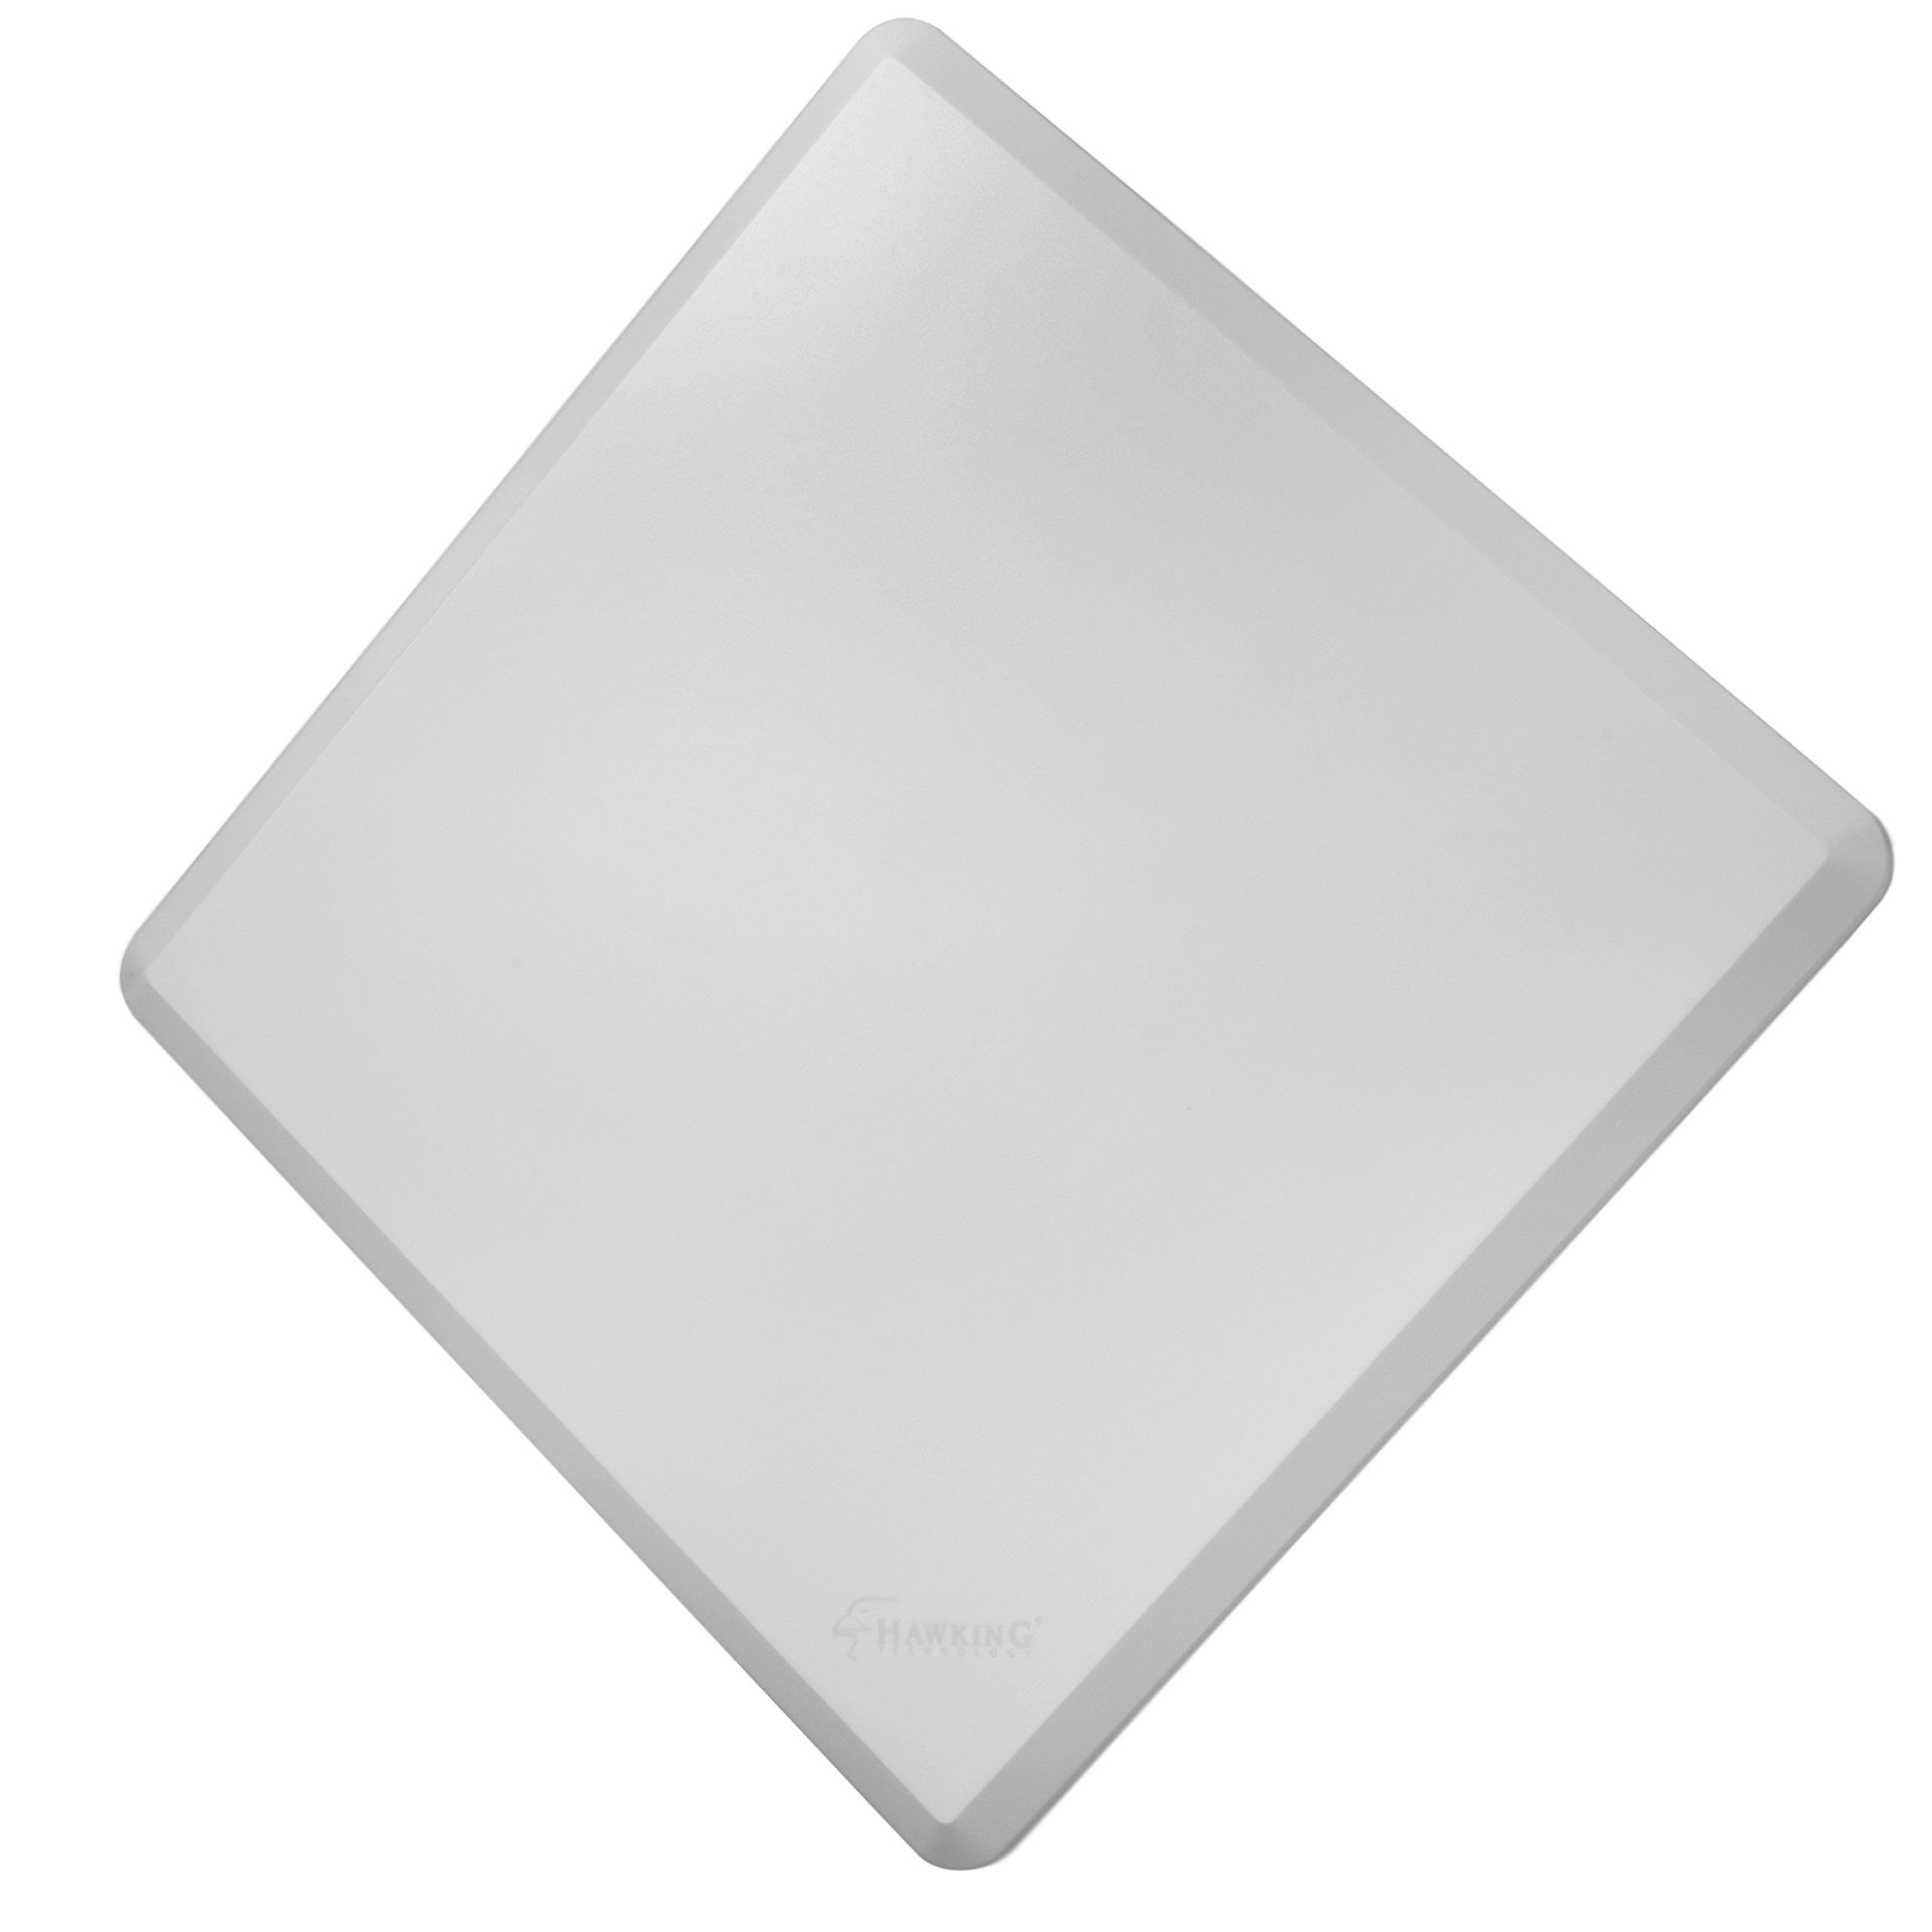 Hawking Technology Hi-Gain Outdoor Wireless-N Wi-Fi 17dBi Mimo 2.4GHz Dual-Polarization Directional Antenna Kit (HAO17SDP) by Hawking Technology